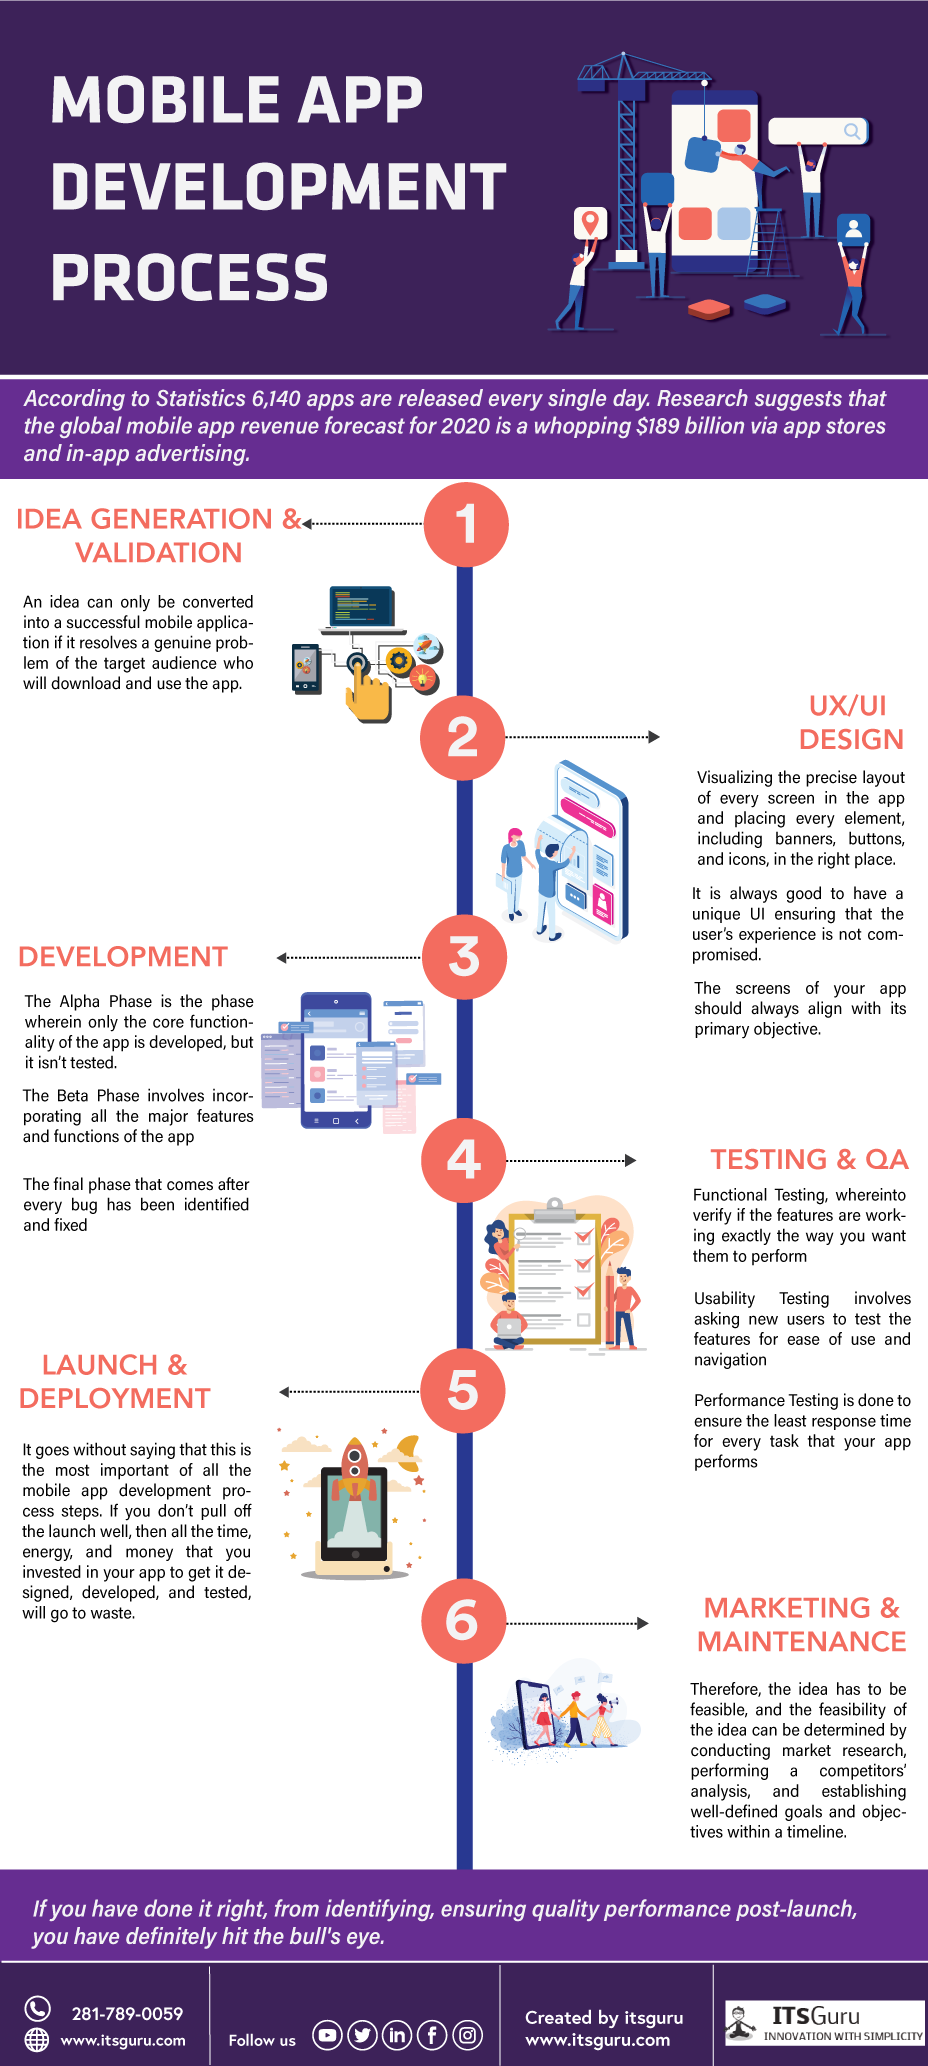 Mobile App Development Process - Infographic - Itsguru